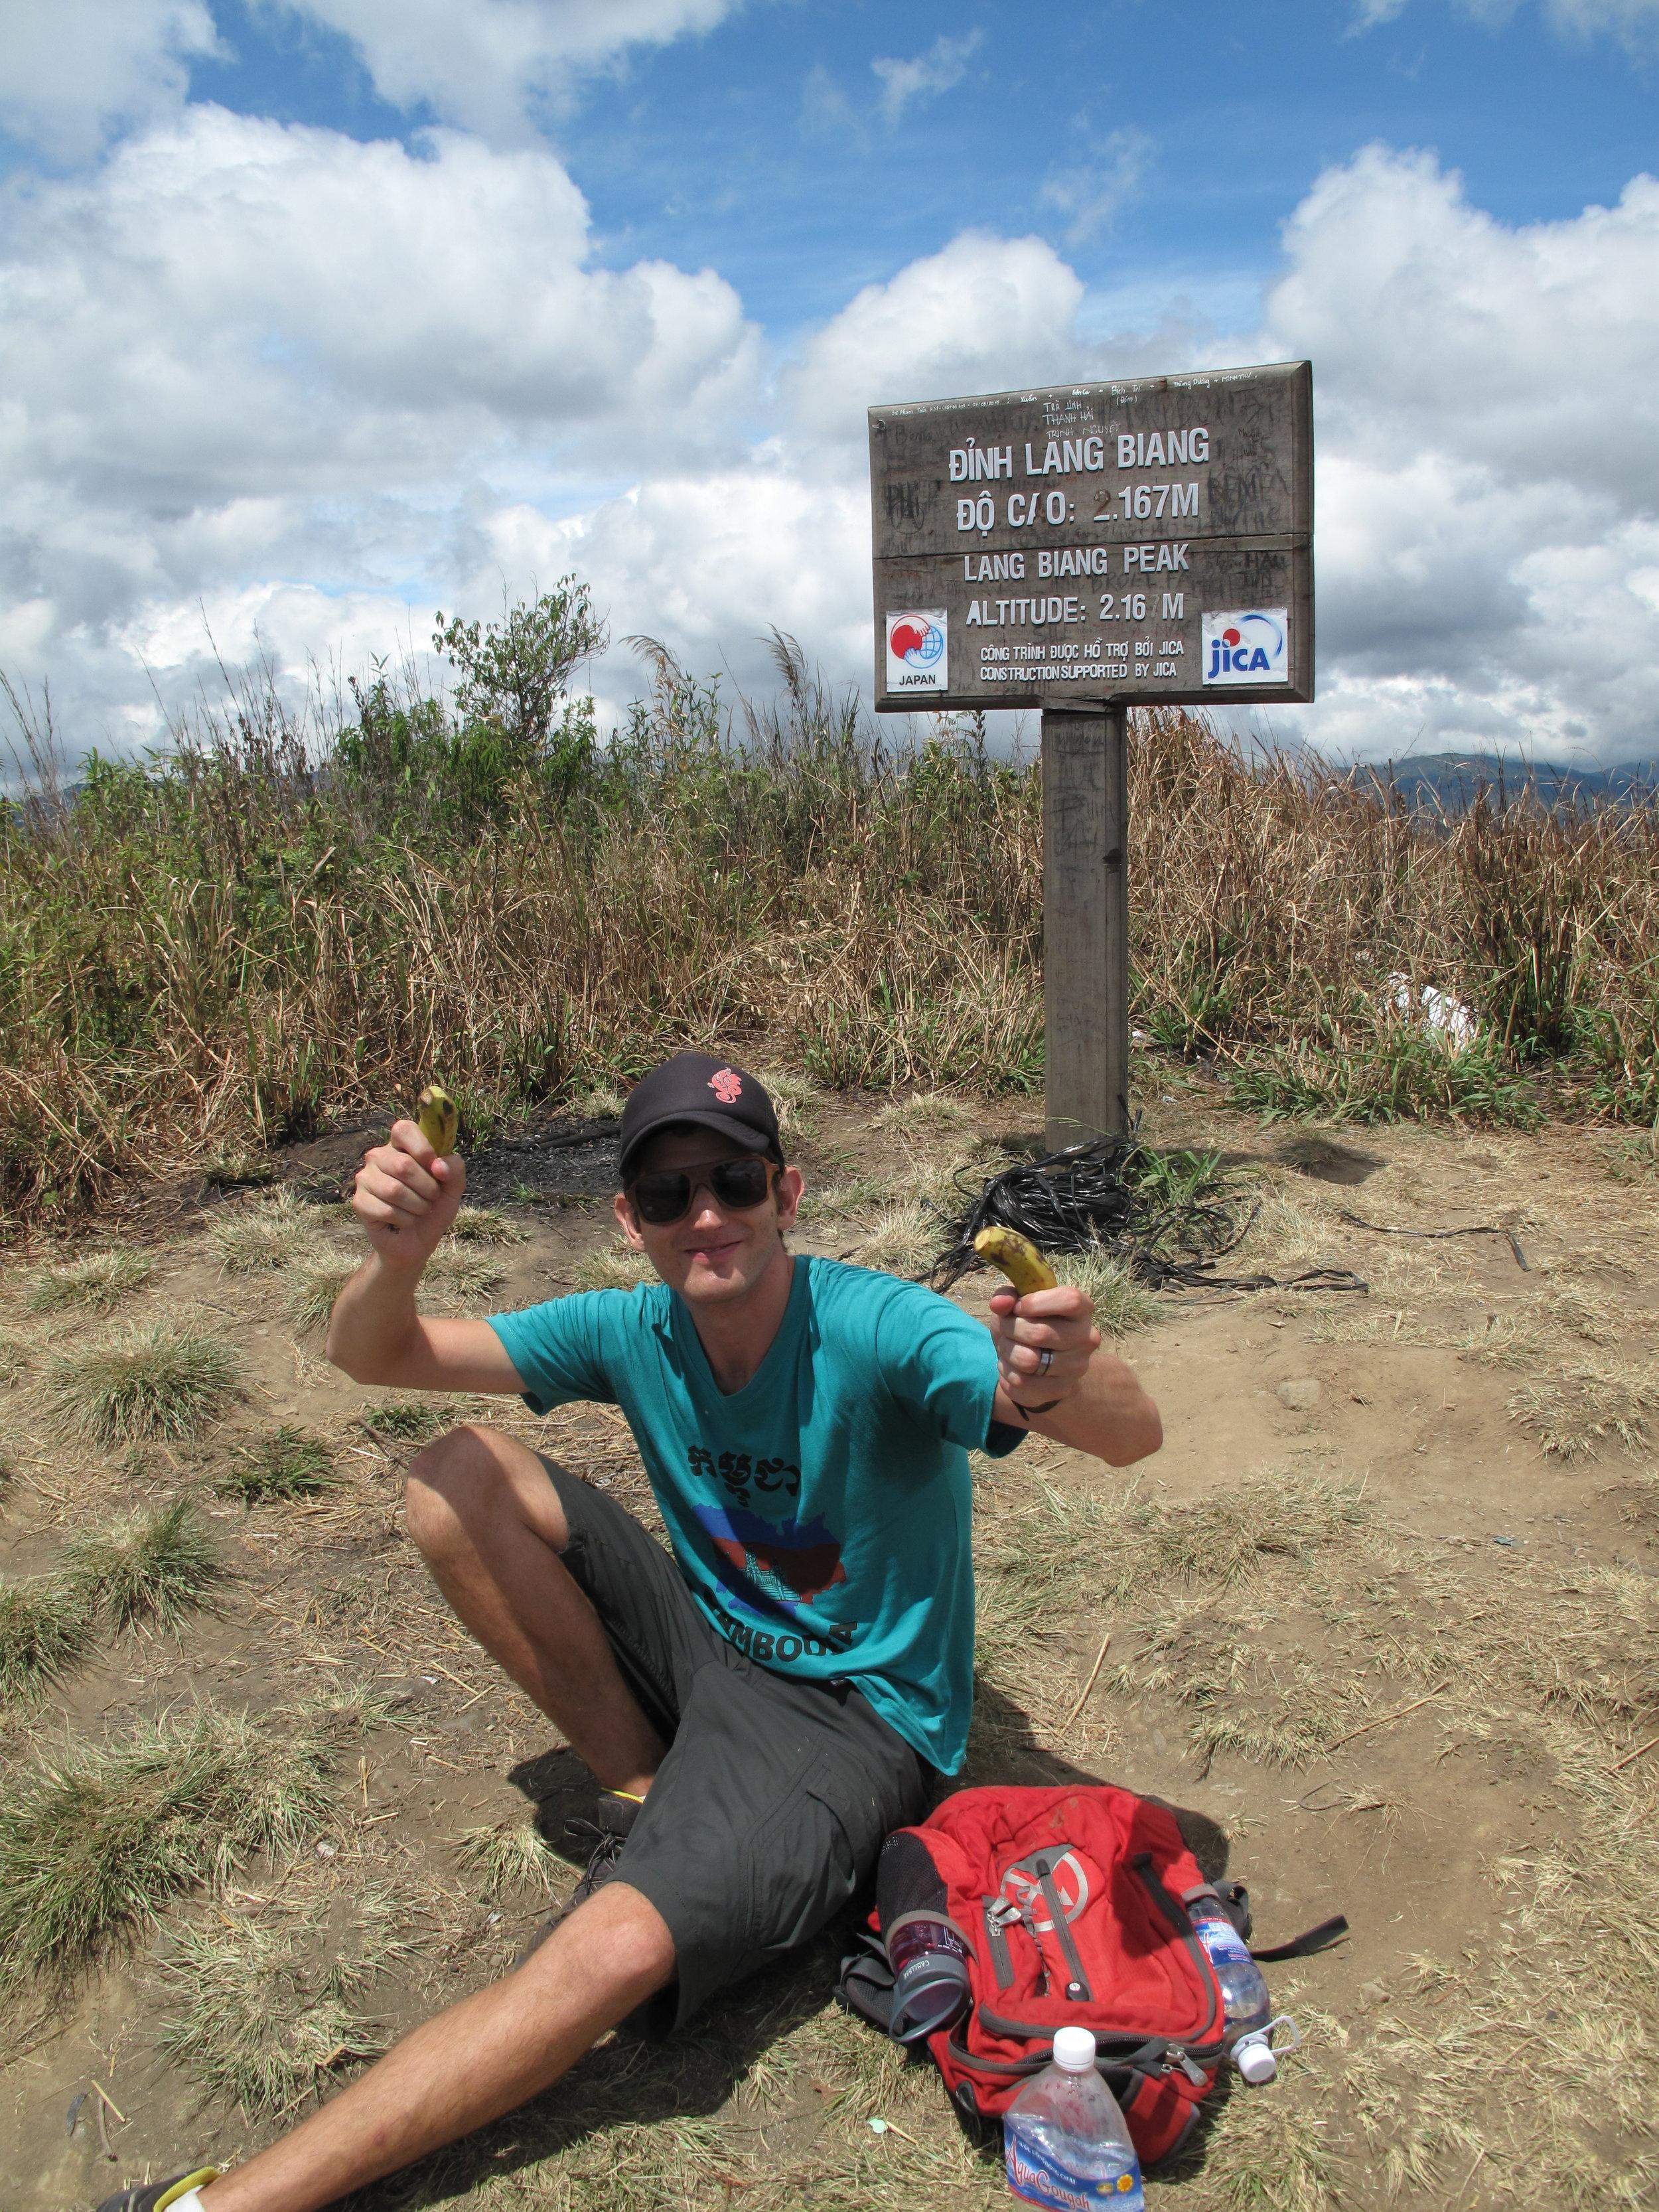 We did it! Lunchtime, Three Peaks hike, Dalat